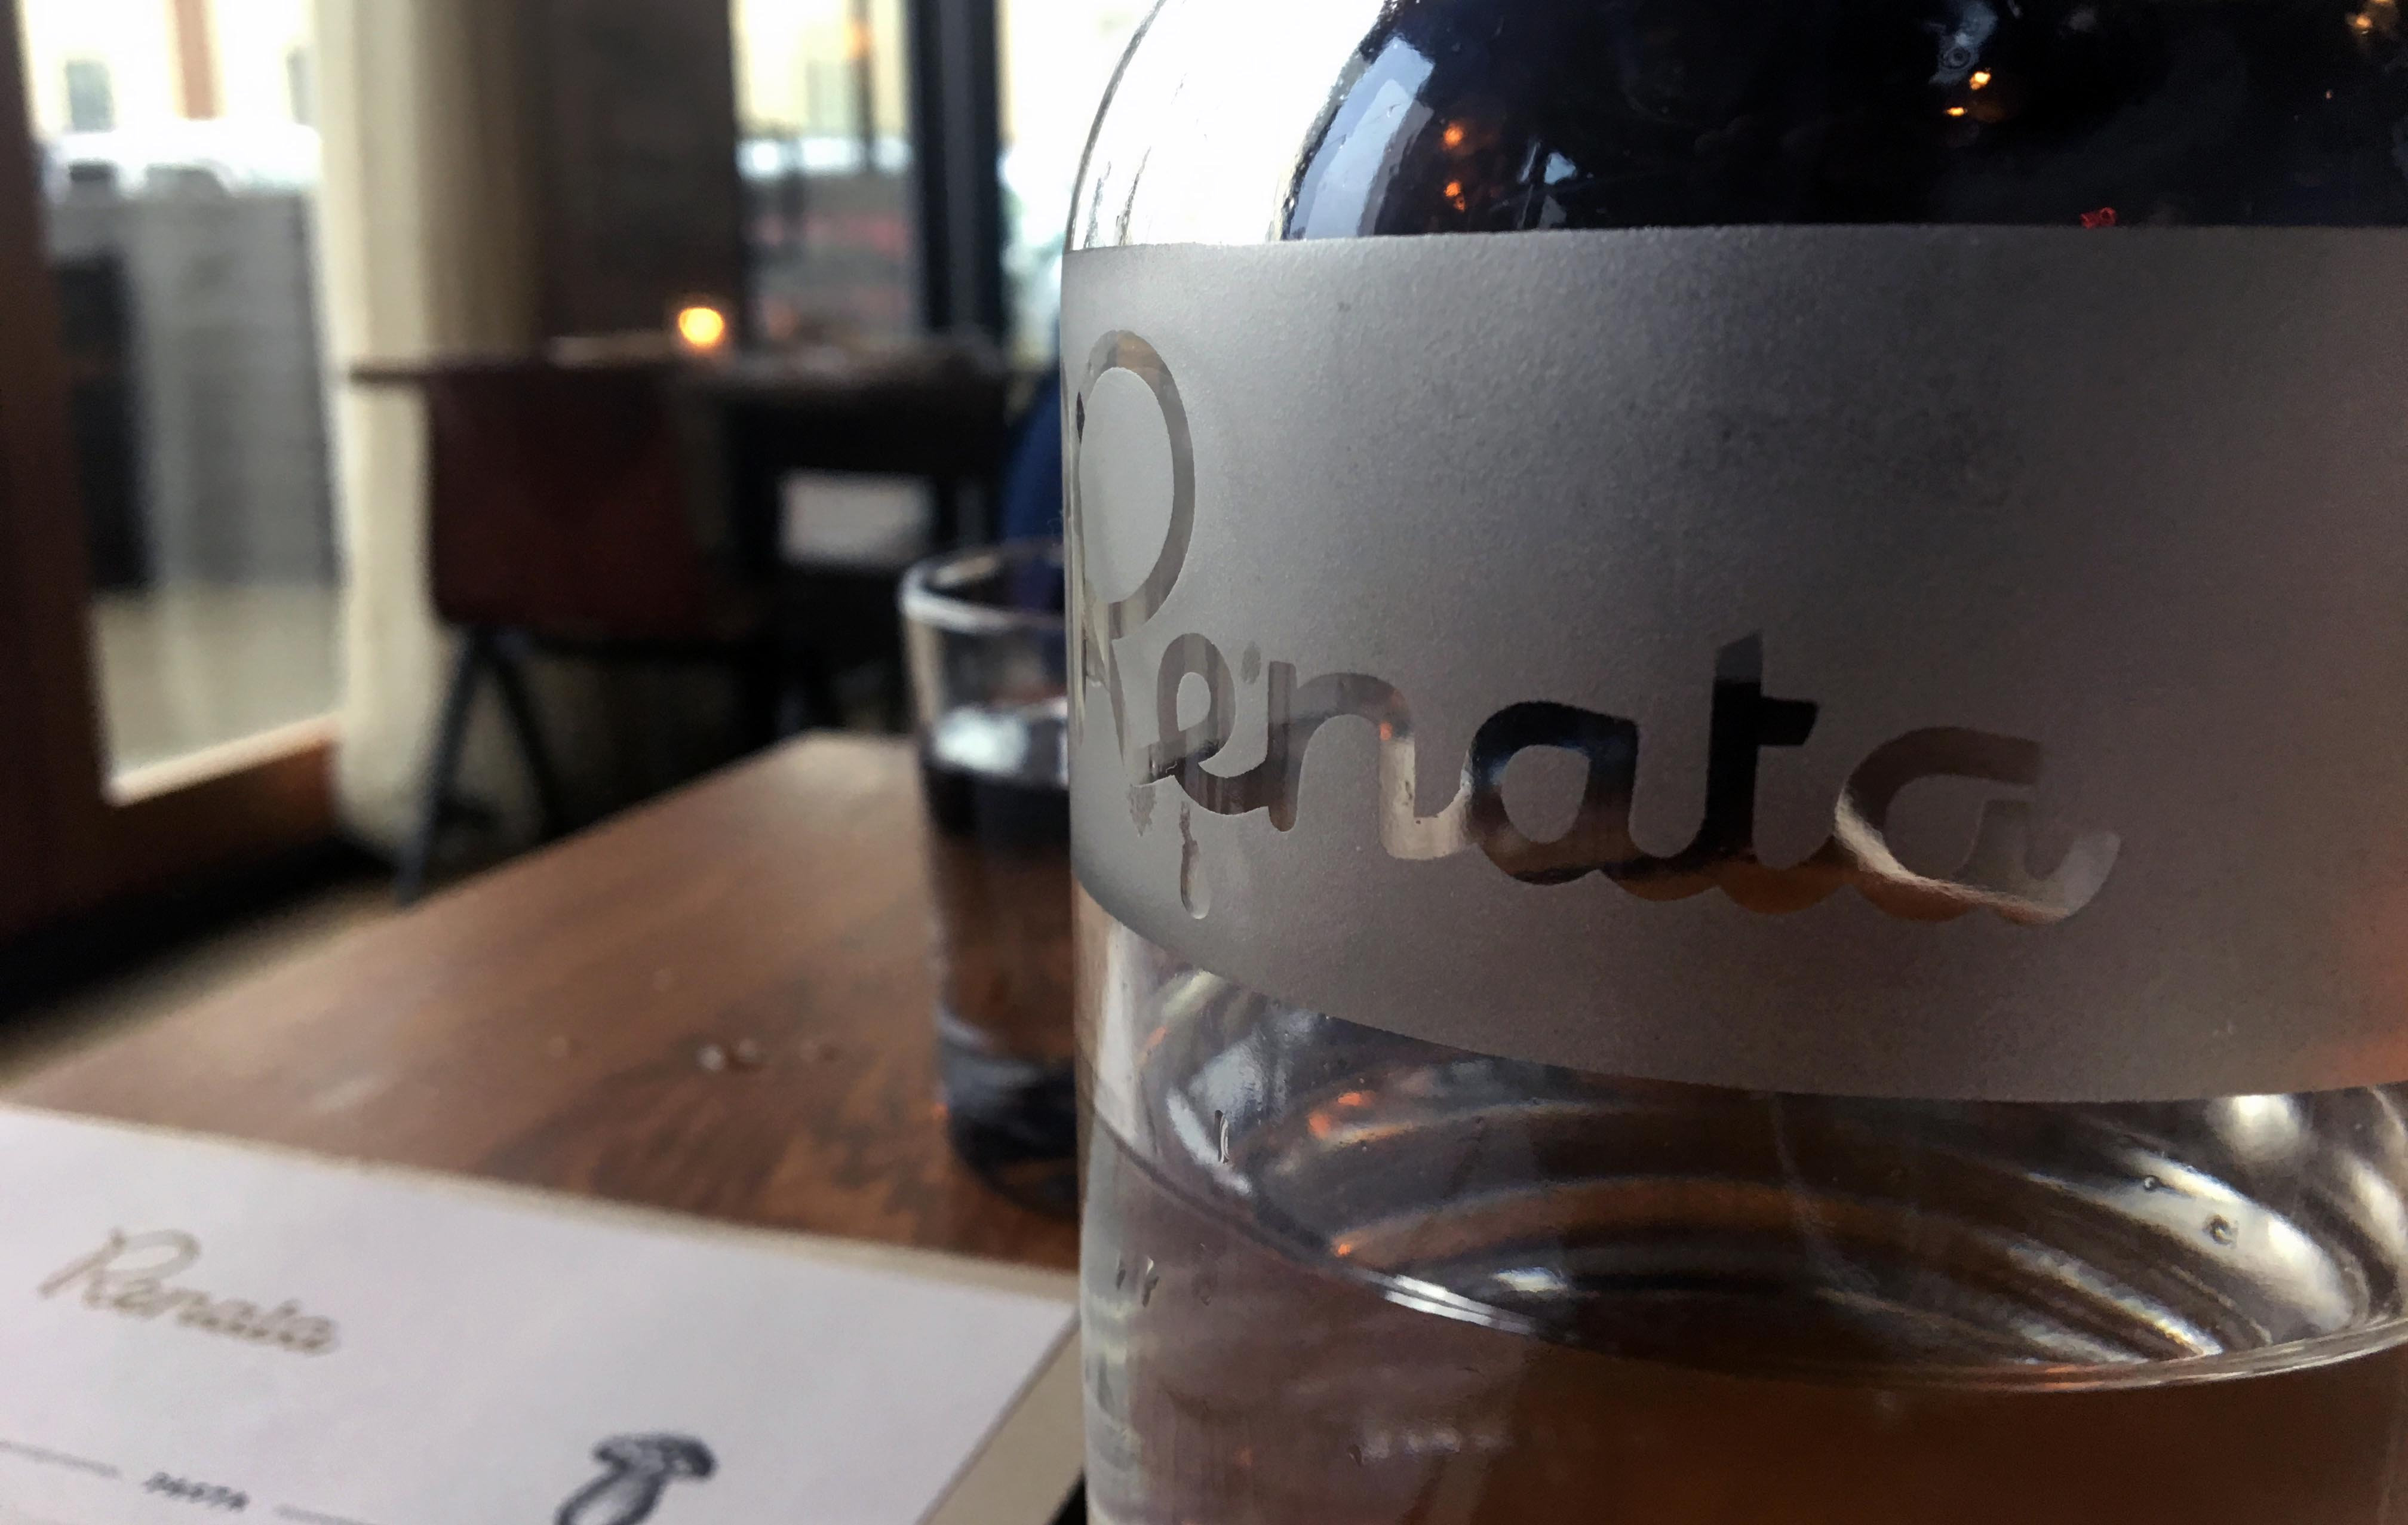 Renata Water Bottle